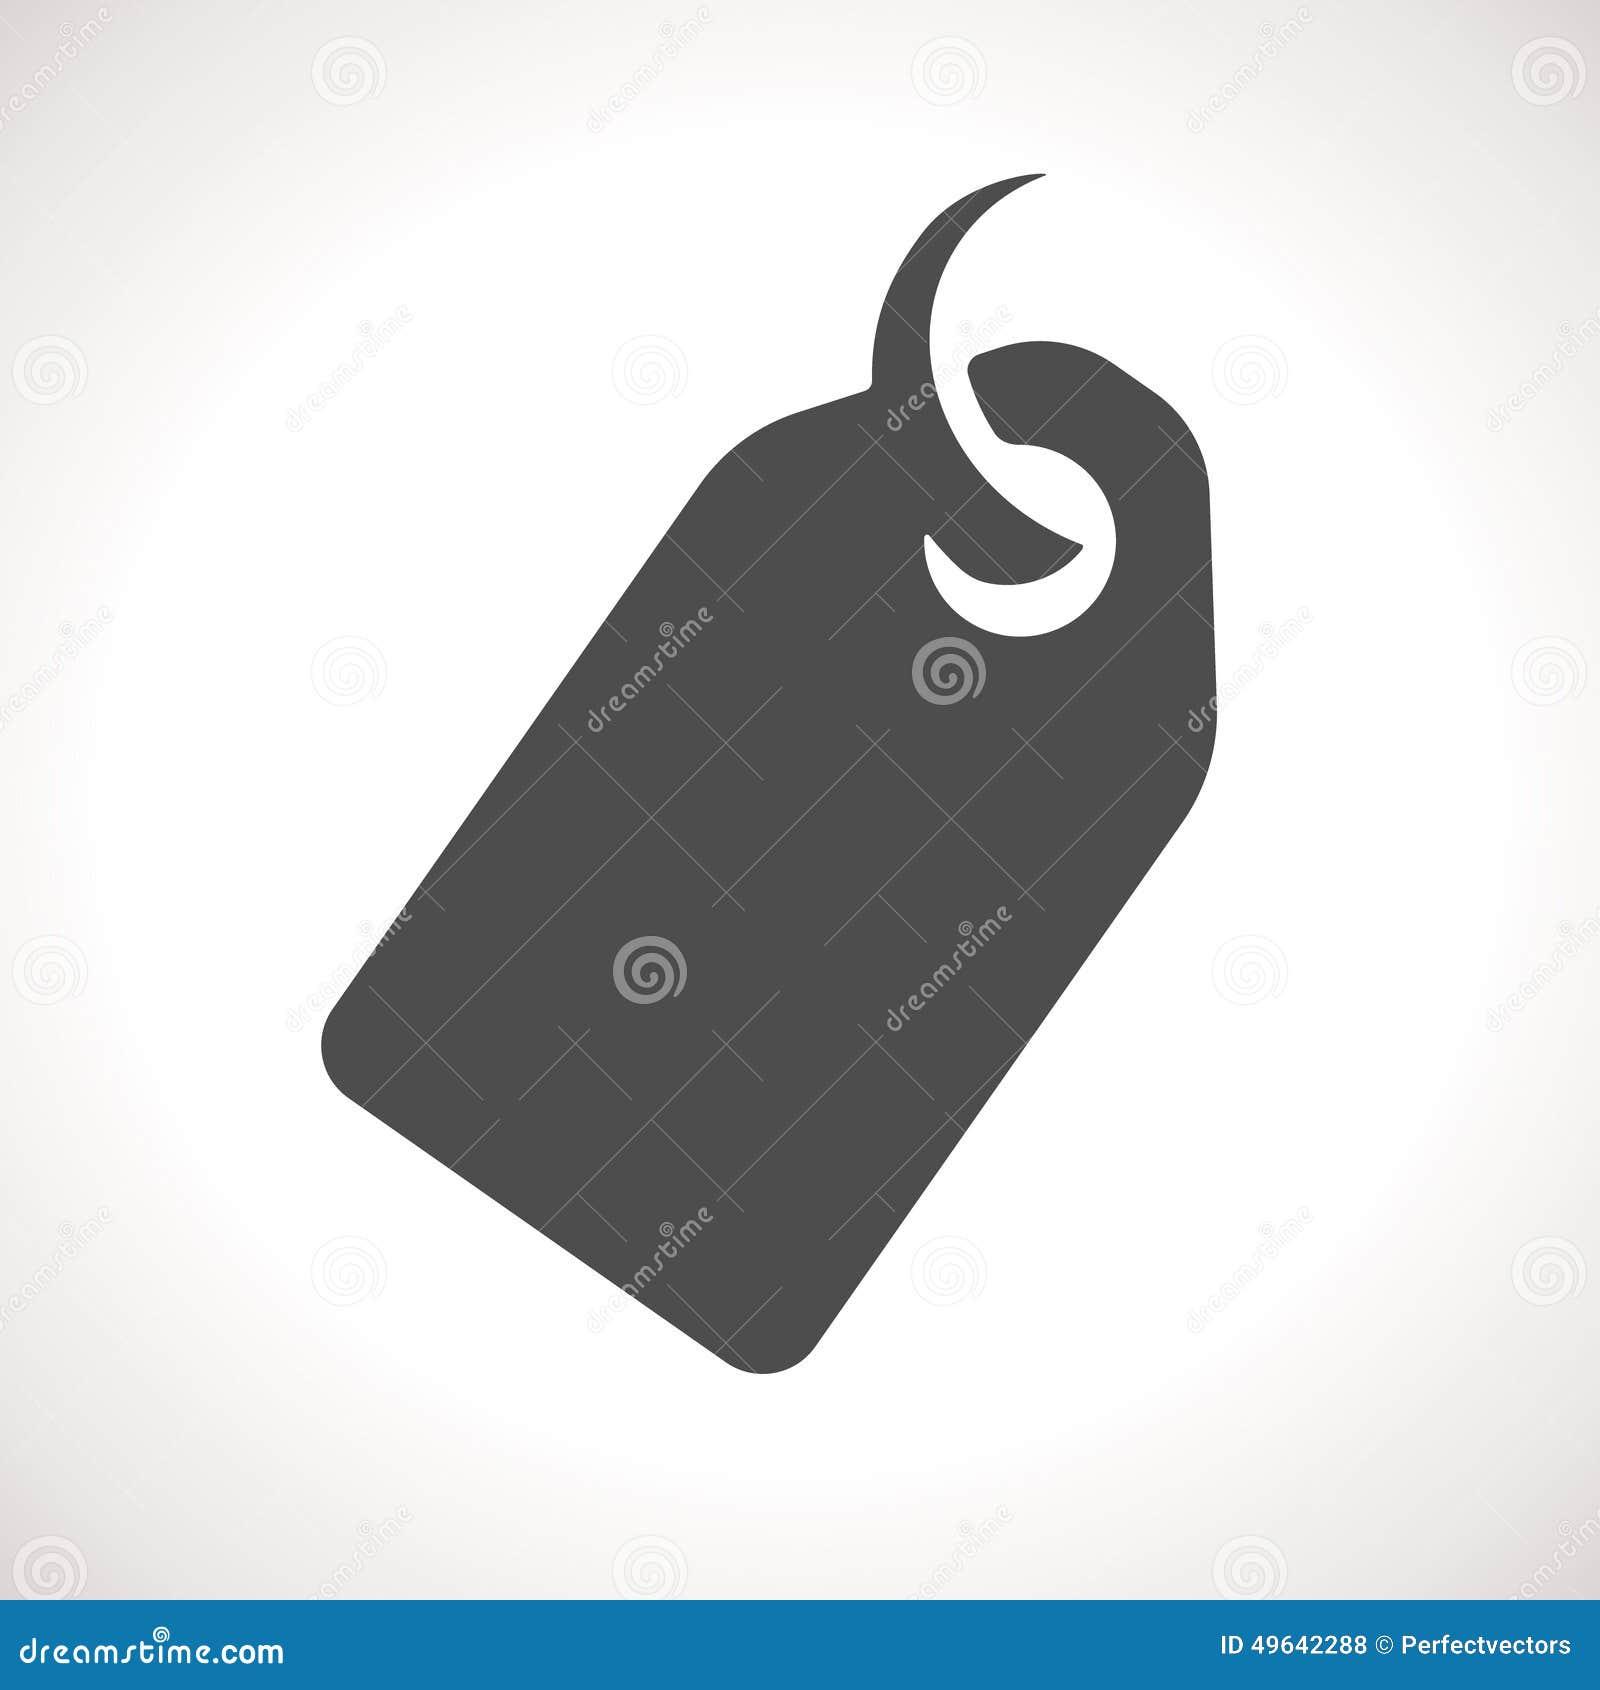 Price Tag, Vector Icon Stock Vector - Image: 49642288